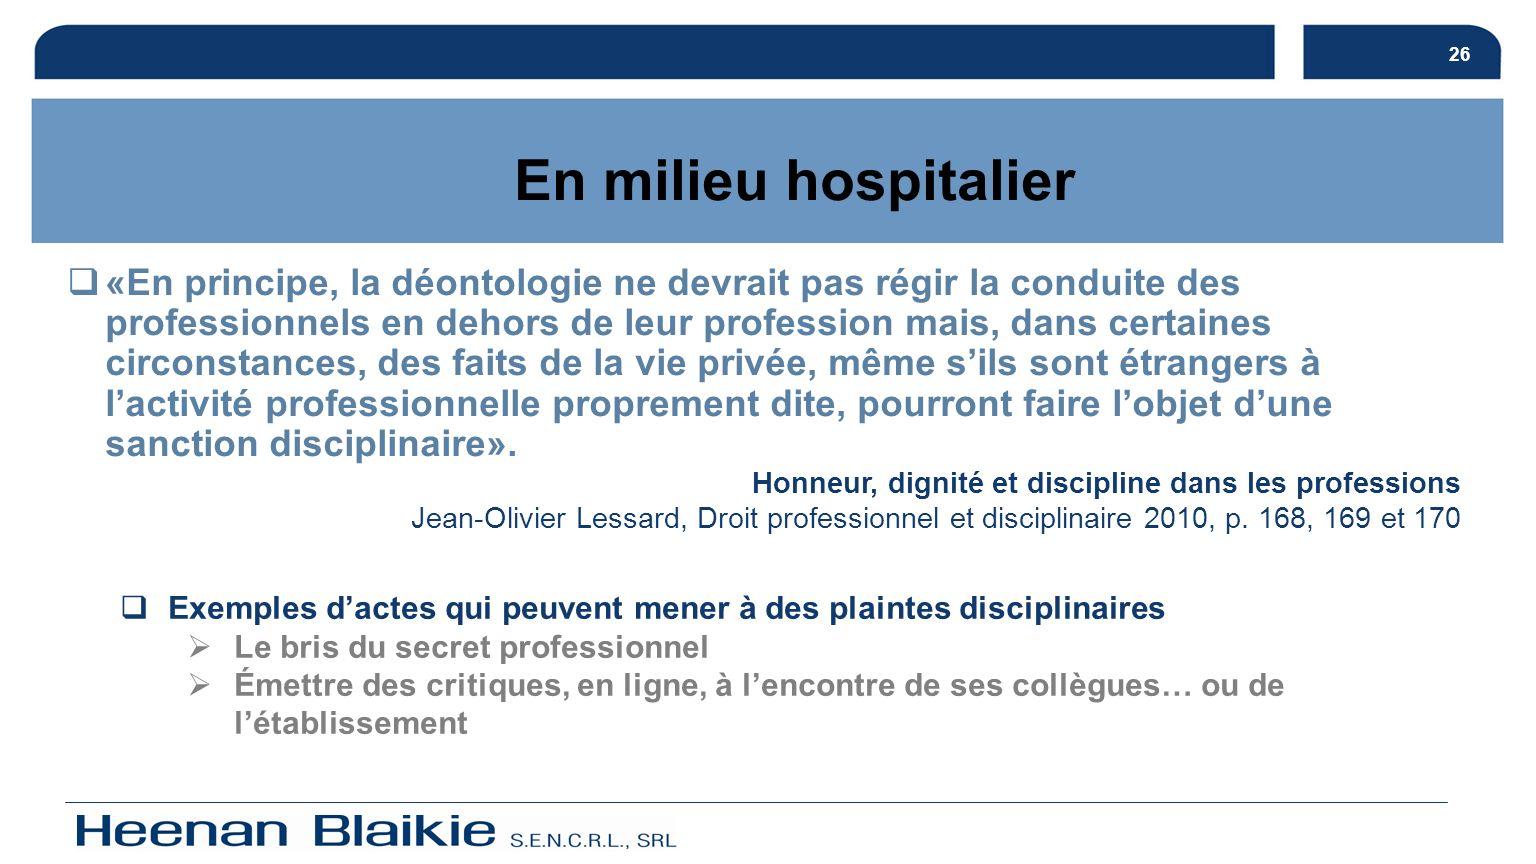 26En milieu hospitalier.